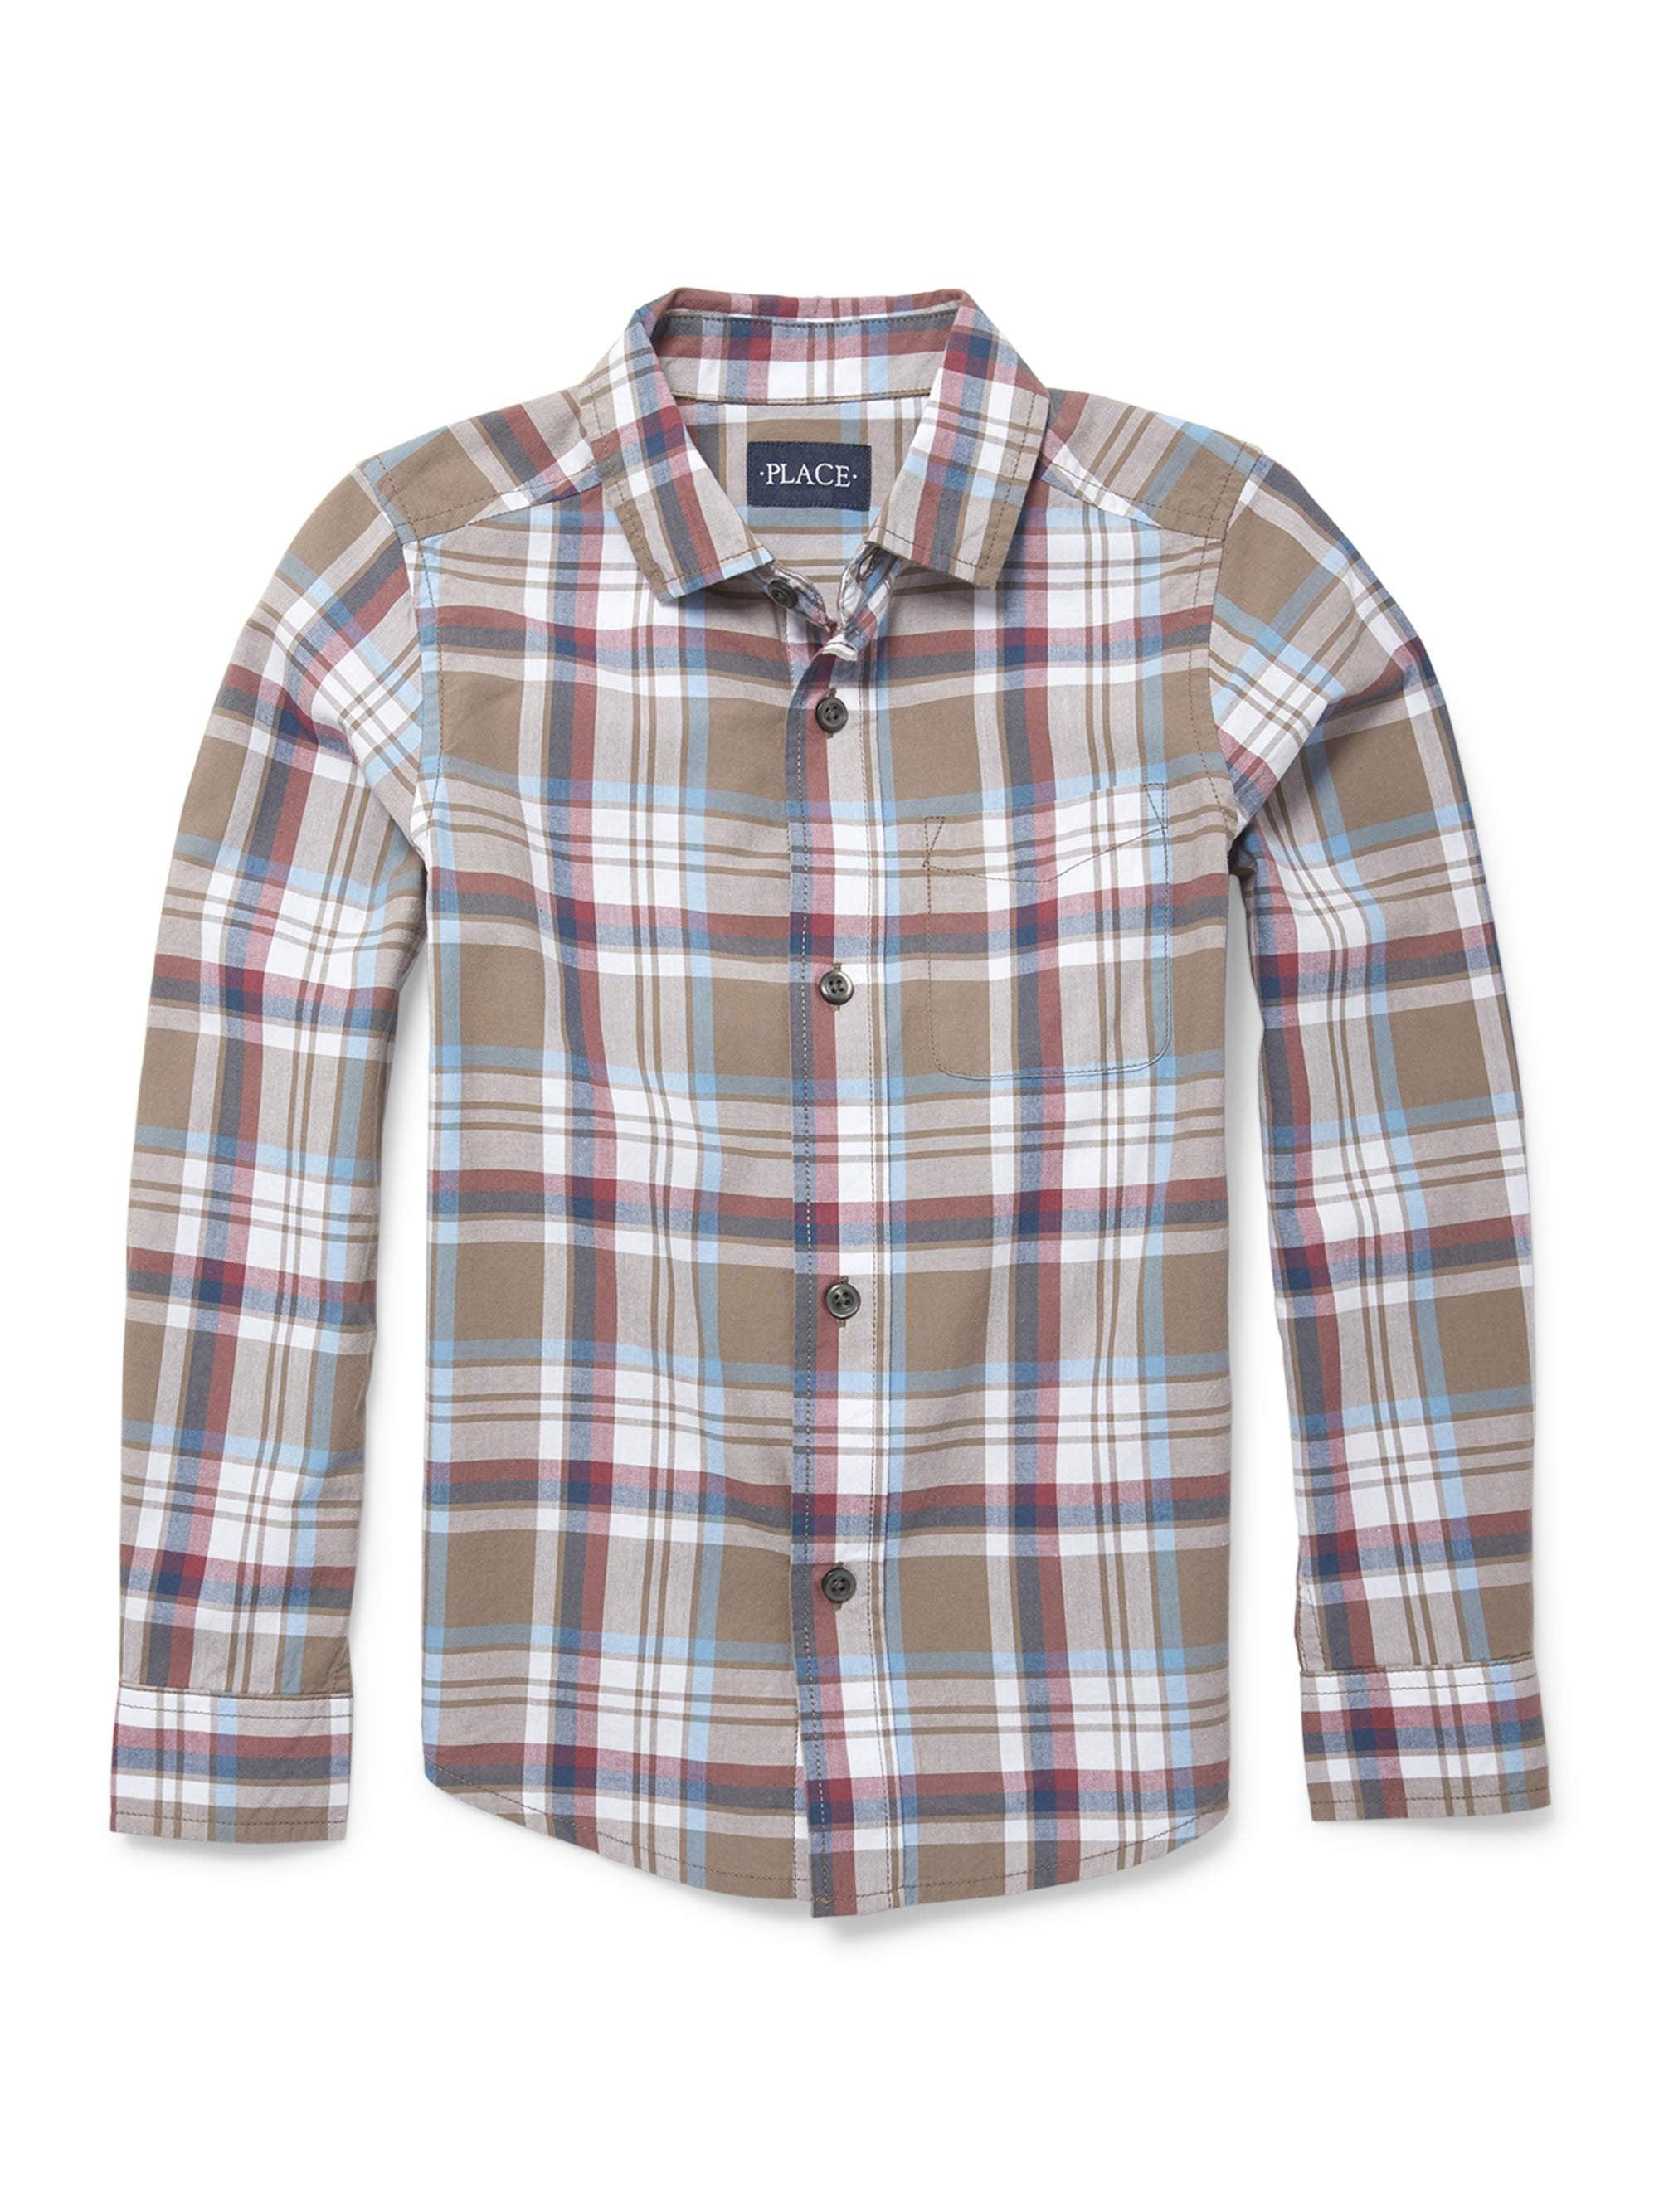 The Children's Place Long Sleeve Button Up Poplin Brown Plaid Shirt (Little Boys & Big Boys)